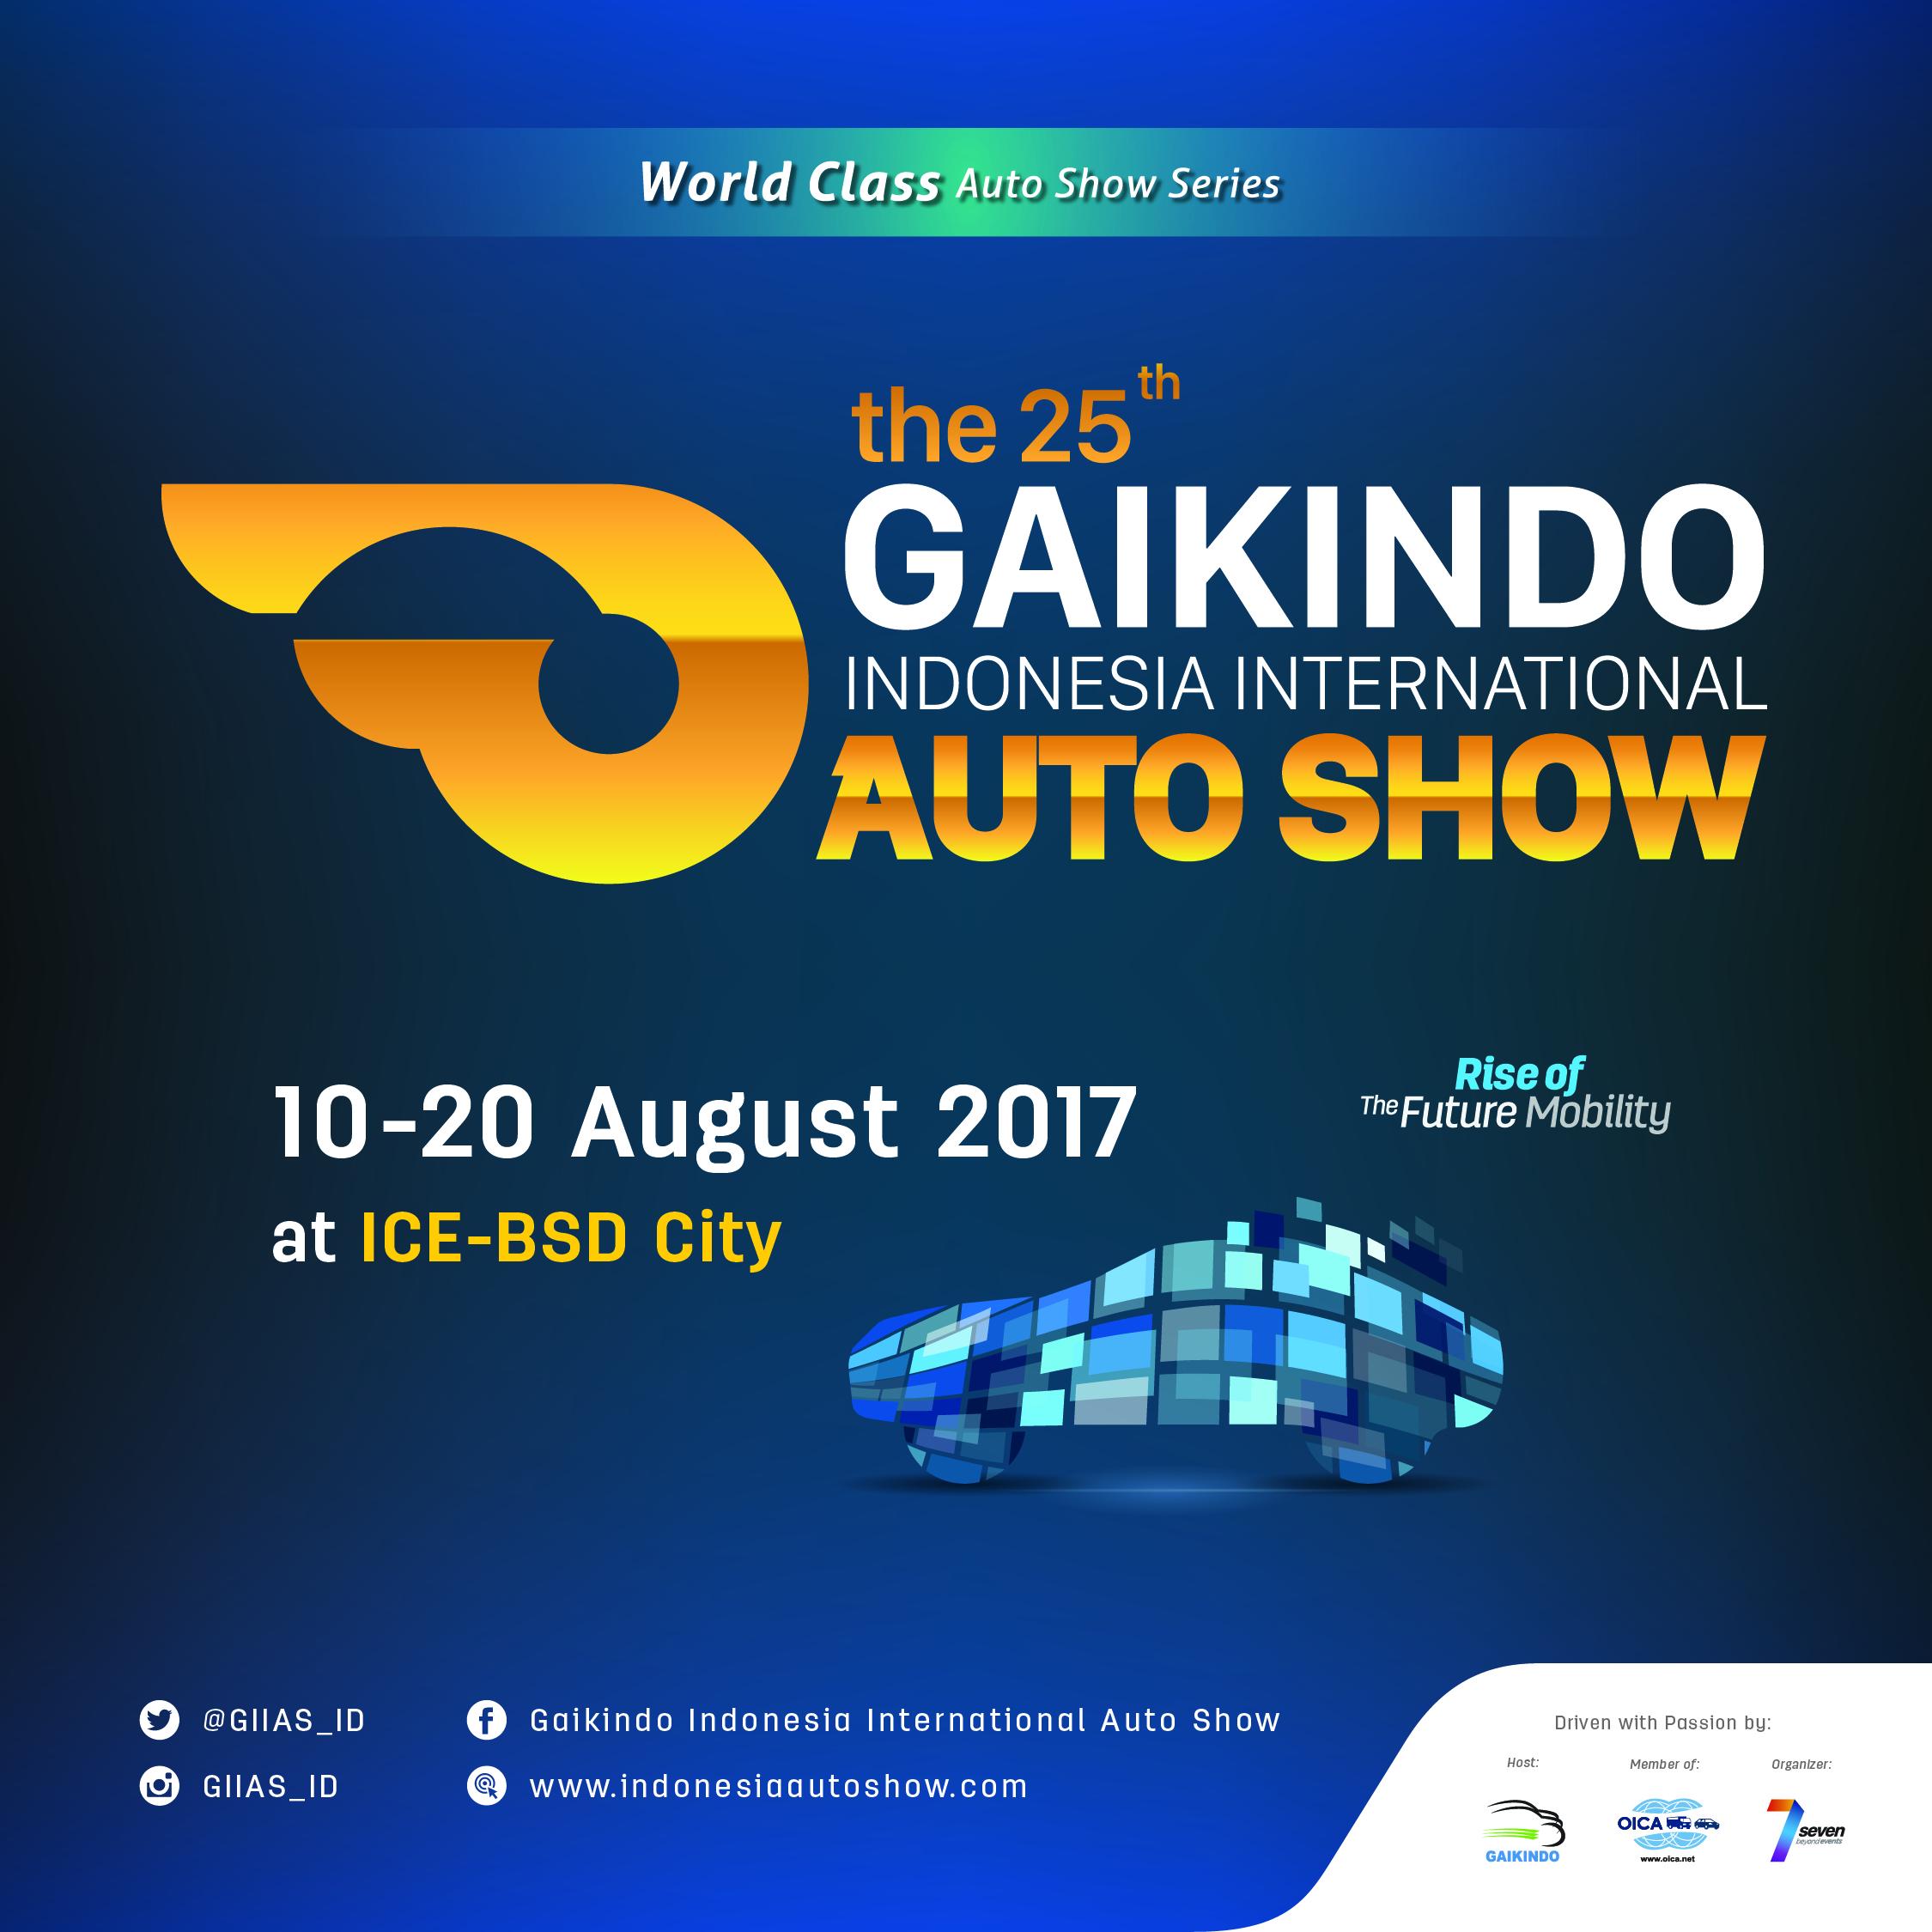 Gaikindo indonesia international auto show